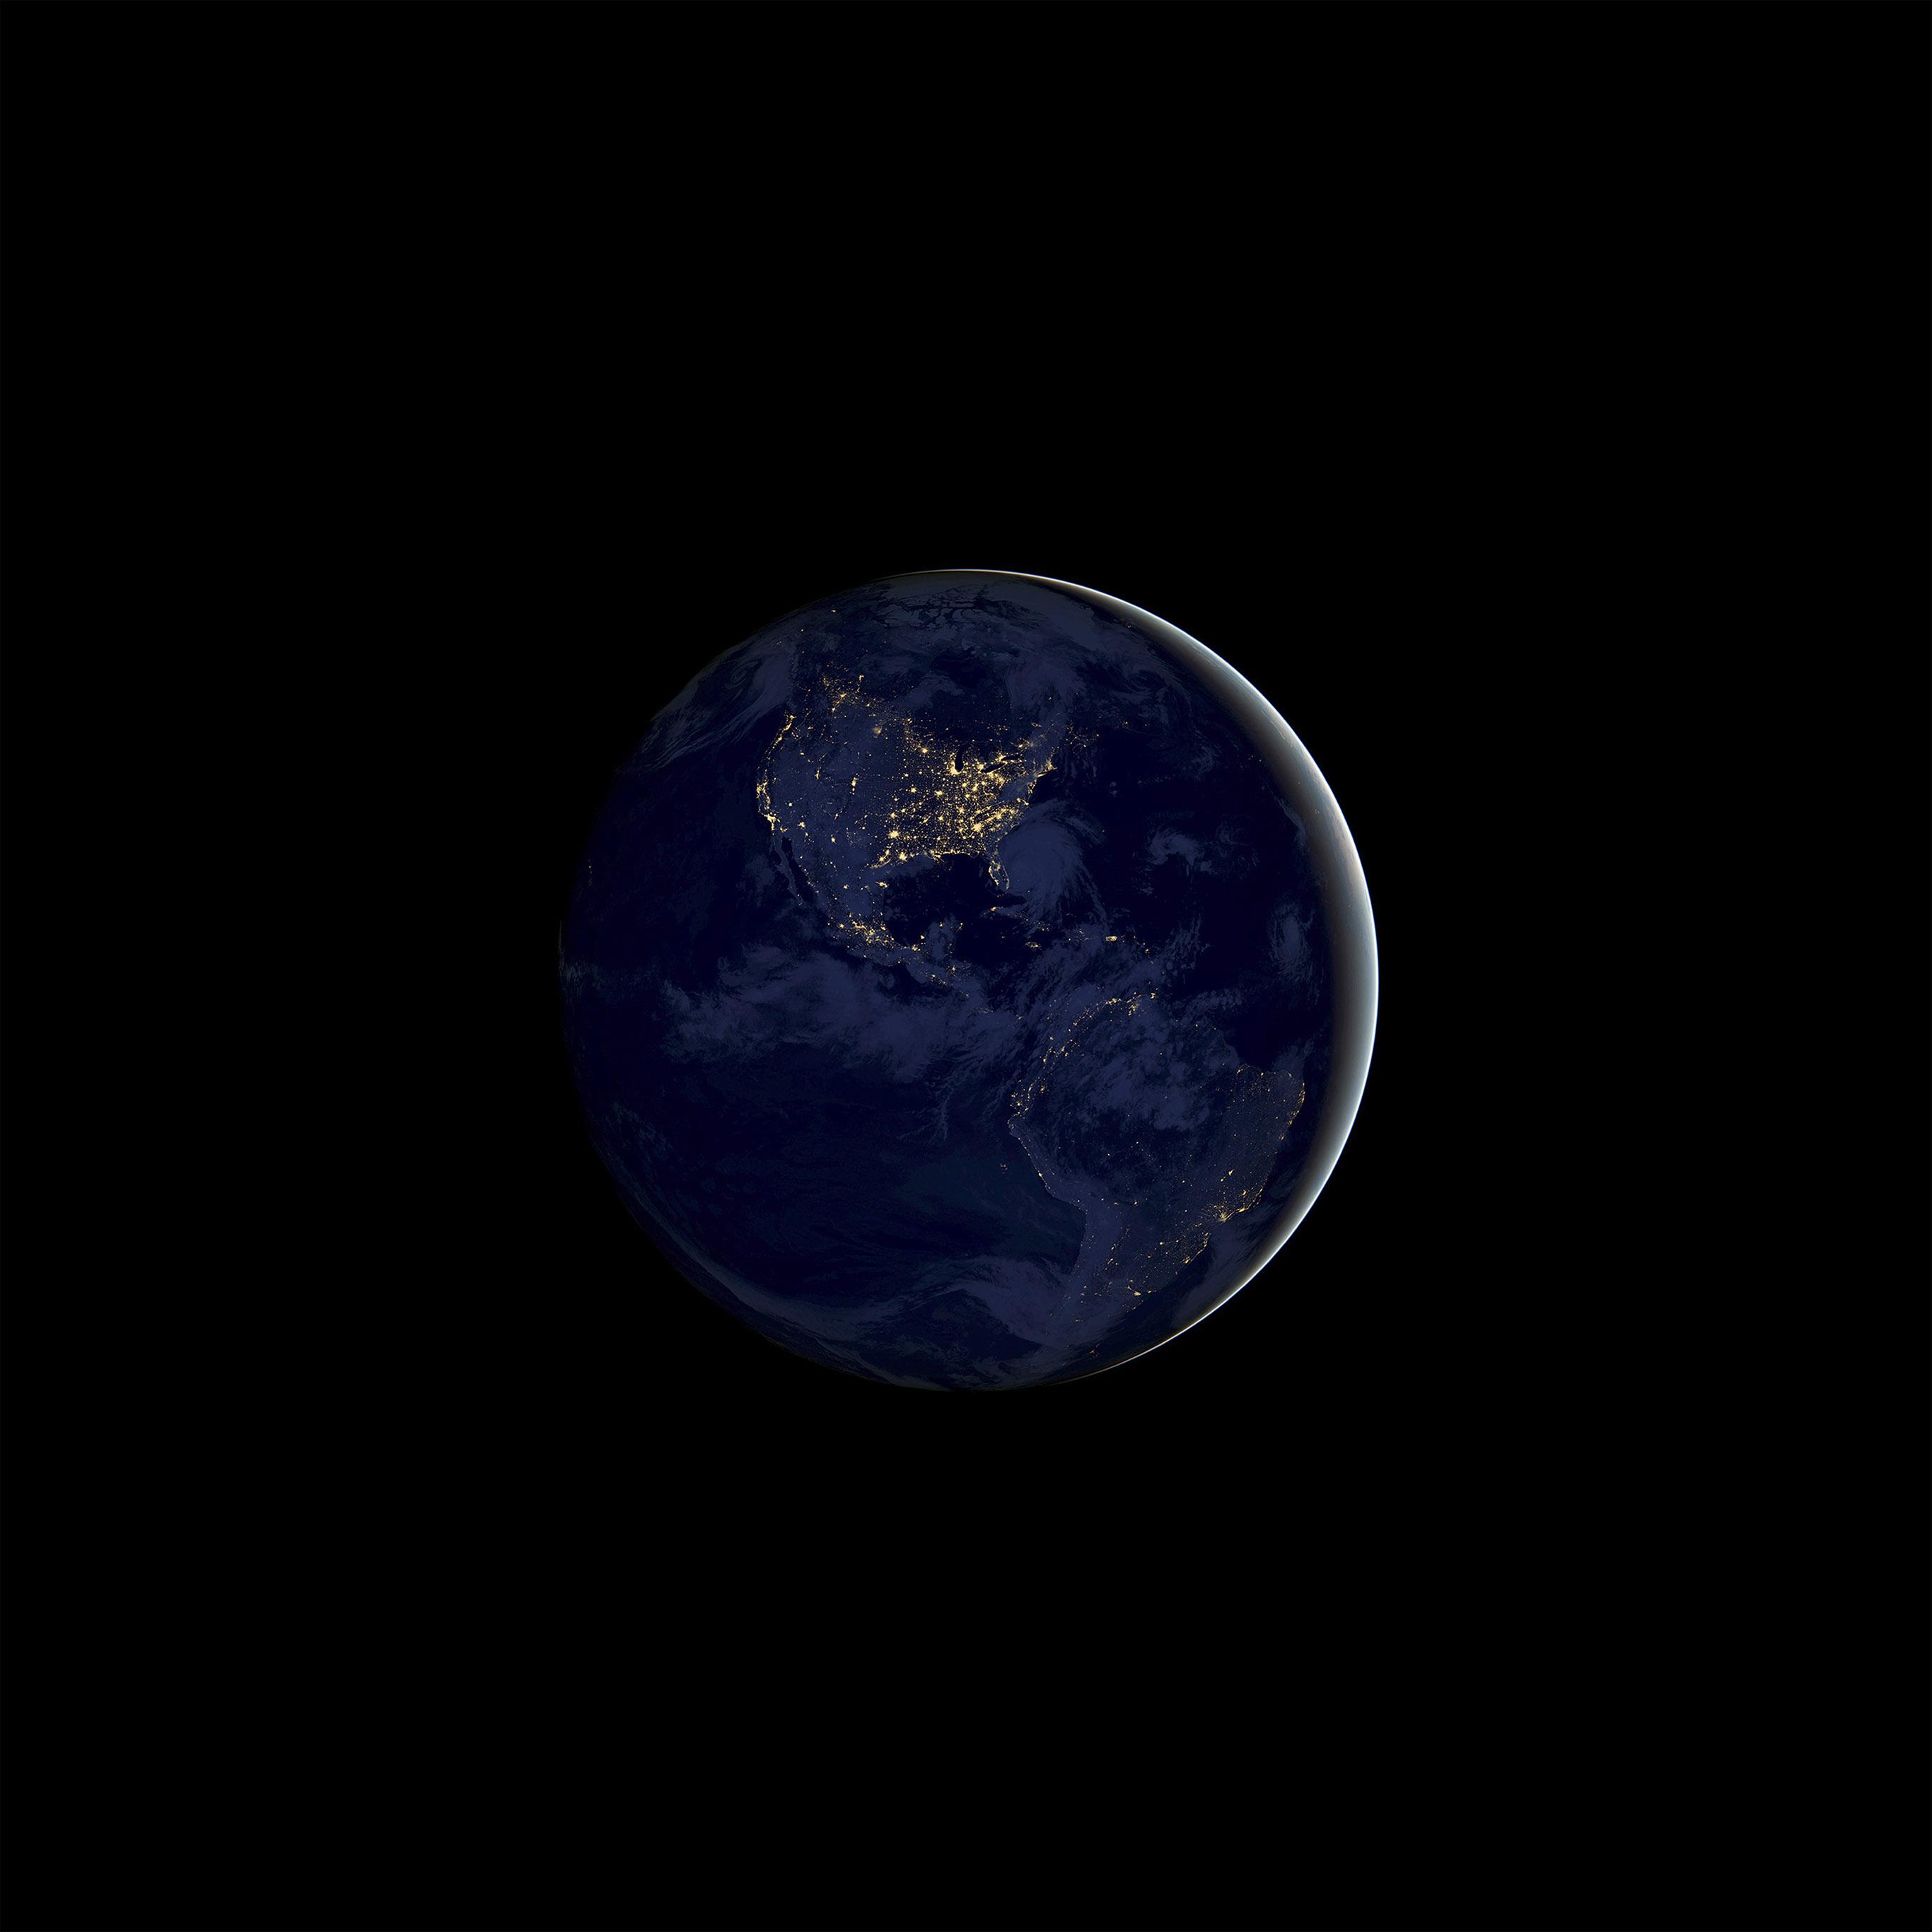 Desktop Wallpaper Earth From Space: Bd20-earth-space-dark-night-art-illustration-wallpaper